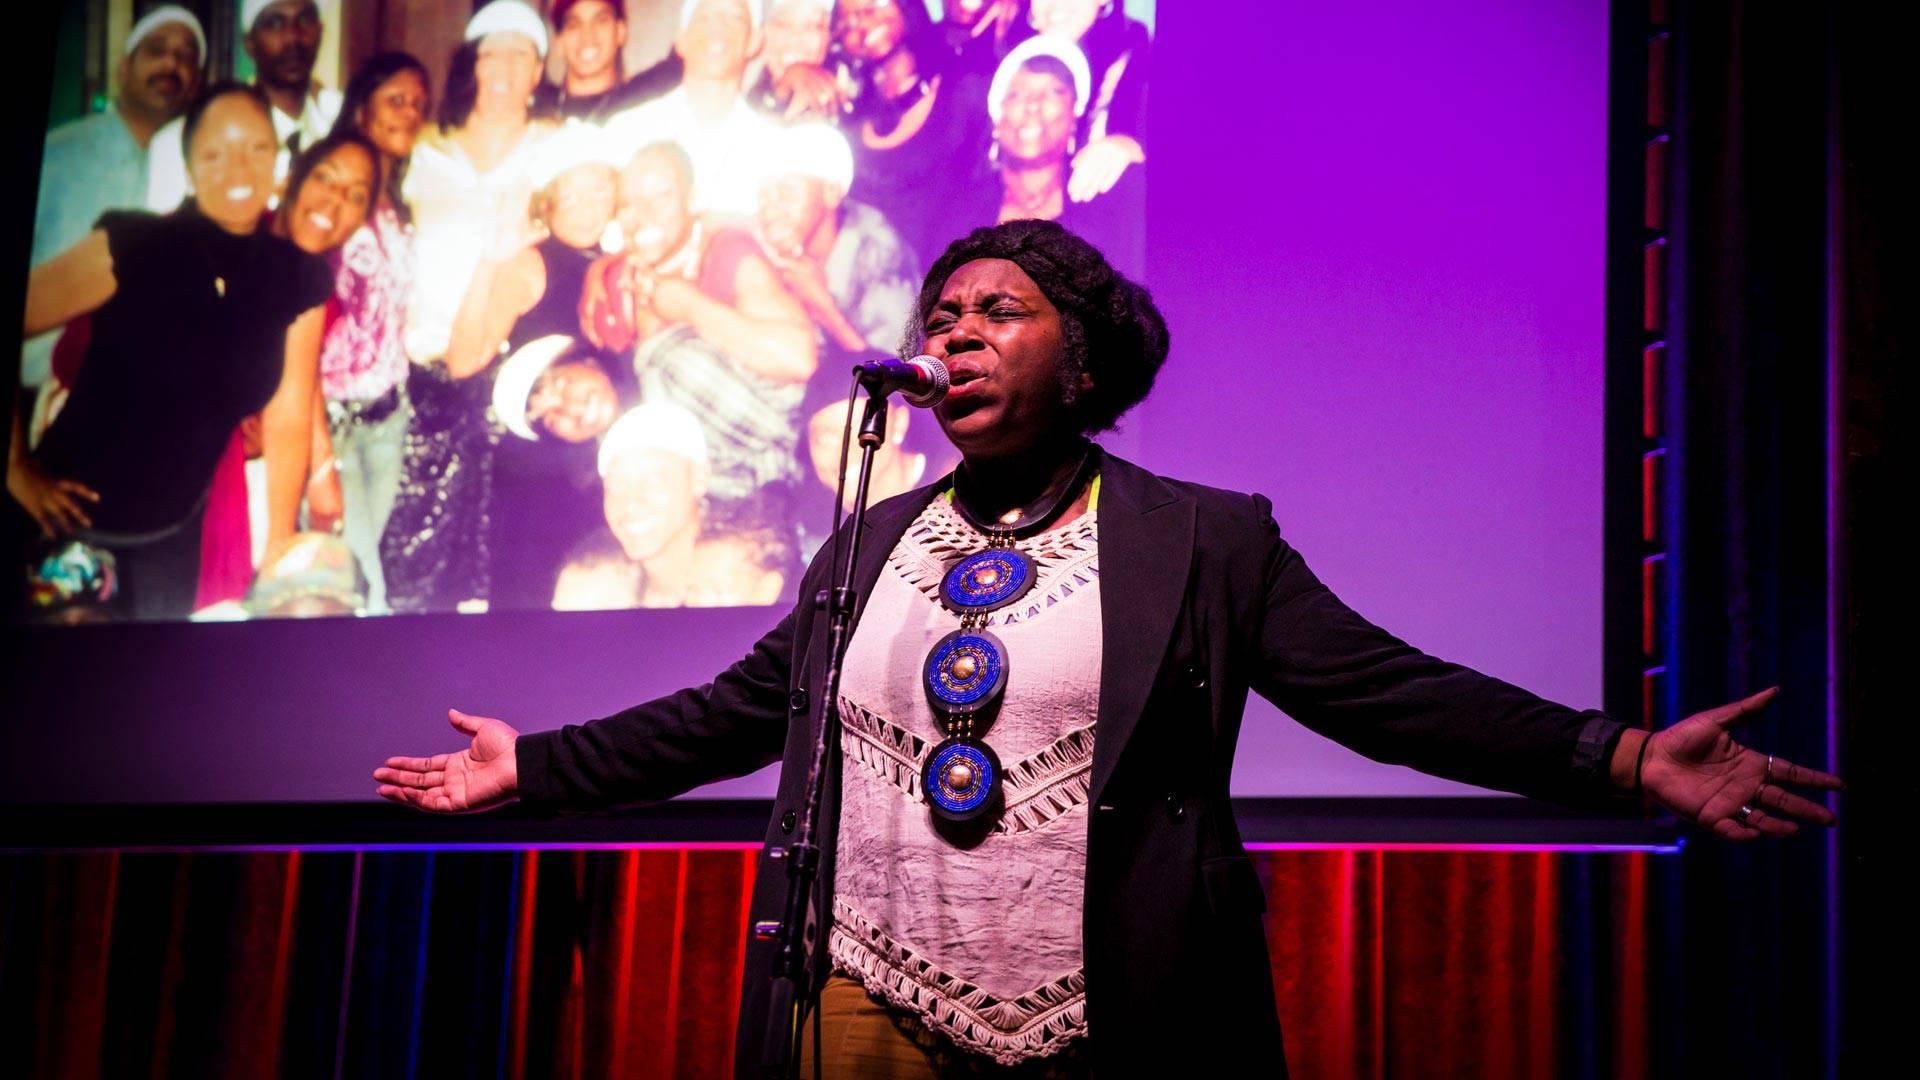 Angelica Ekeke presents 'The Removal' at Swedish American Hall in April 2018. Courtesy Angelica Ekeke